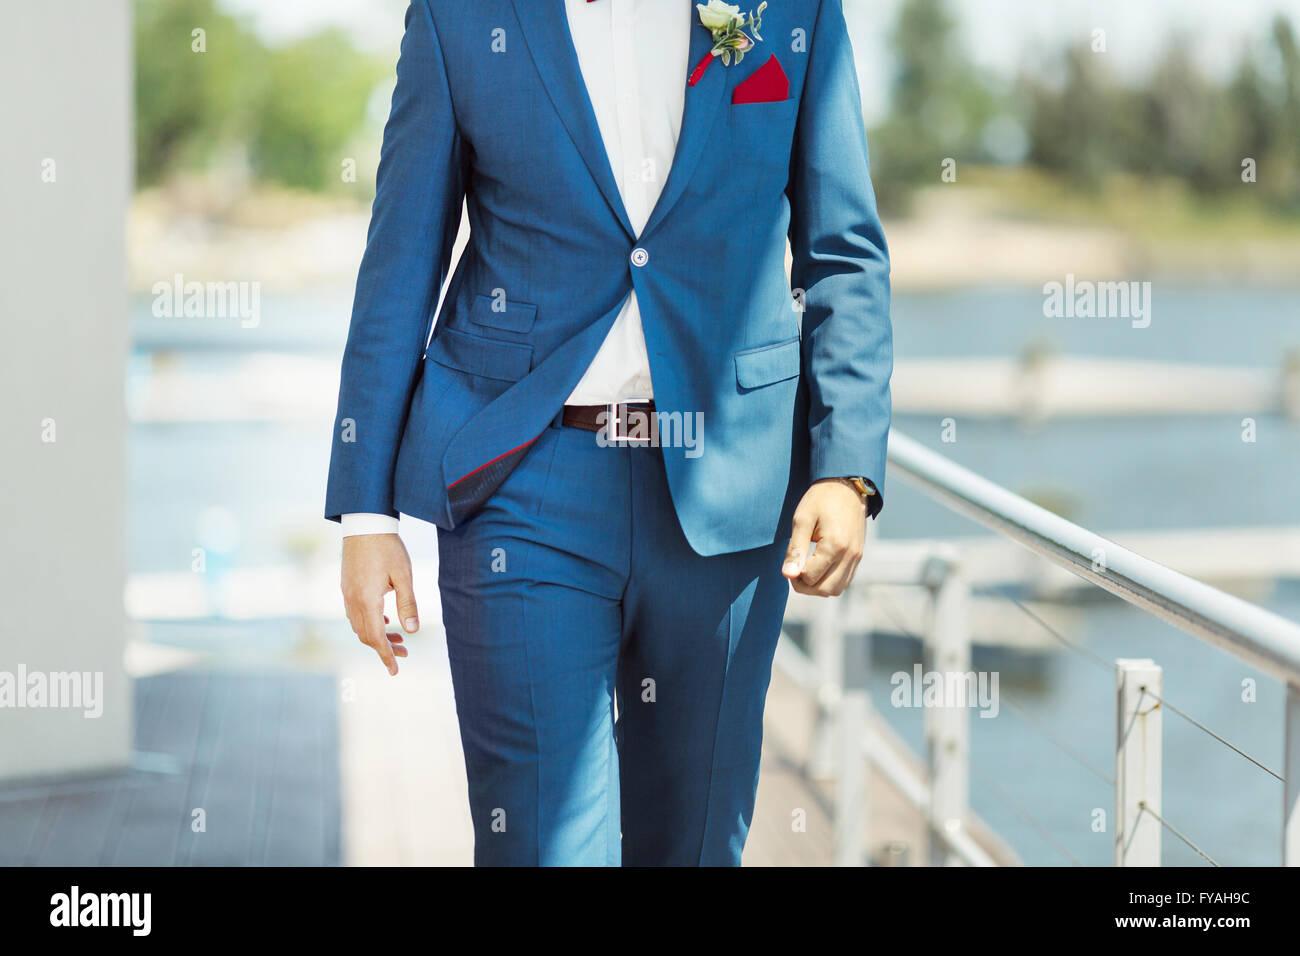 Elegant decoration on man wedding suit Stock Photo: 102880664 - Alamy